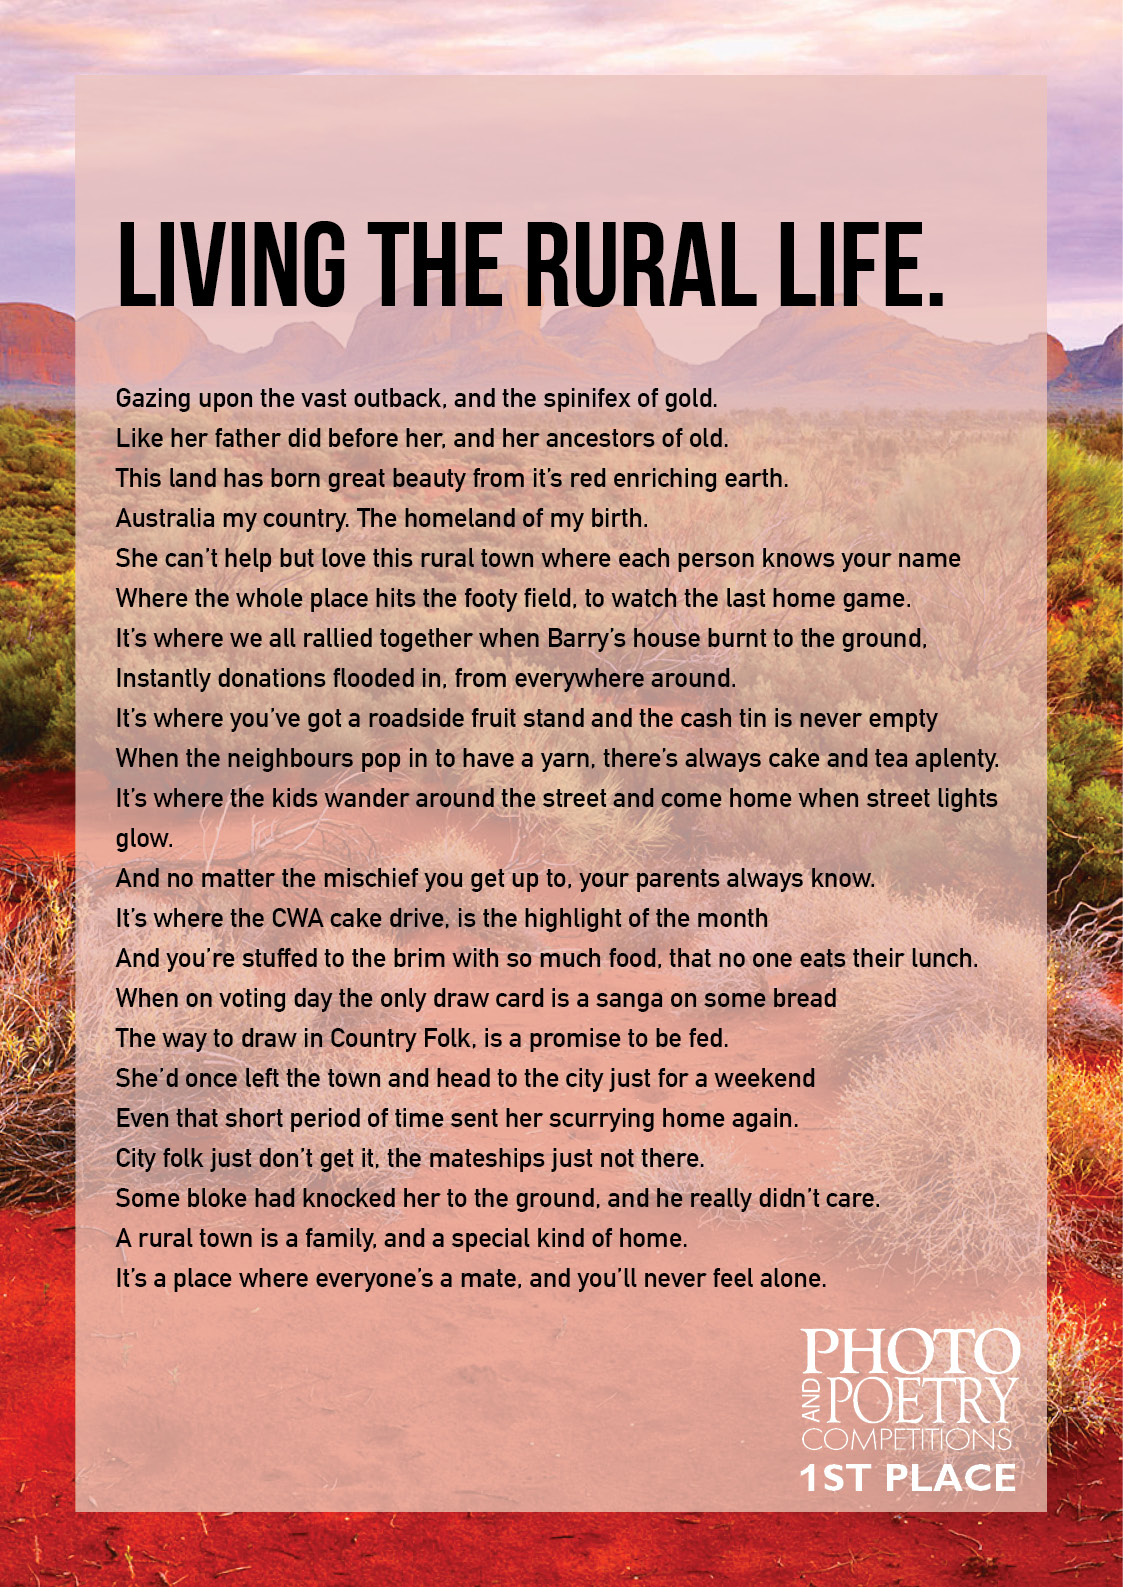 AlexandraStewart - Living the rural life